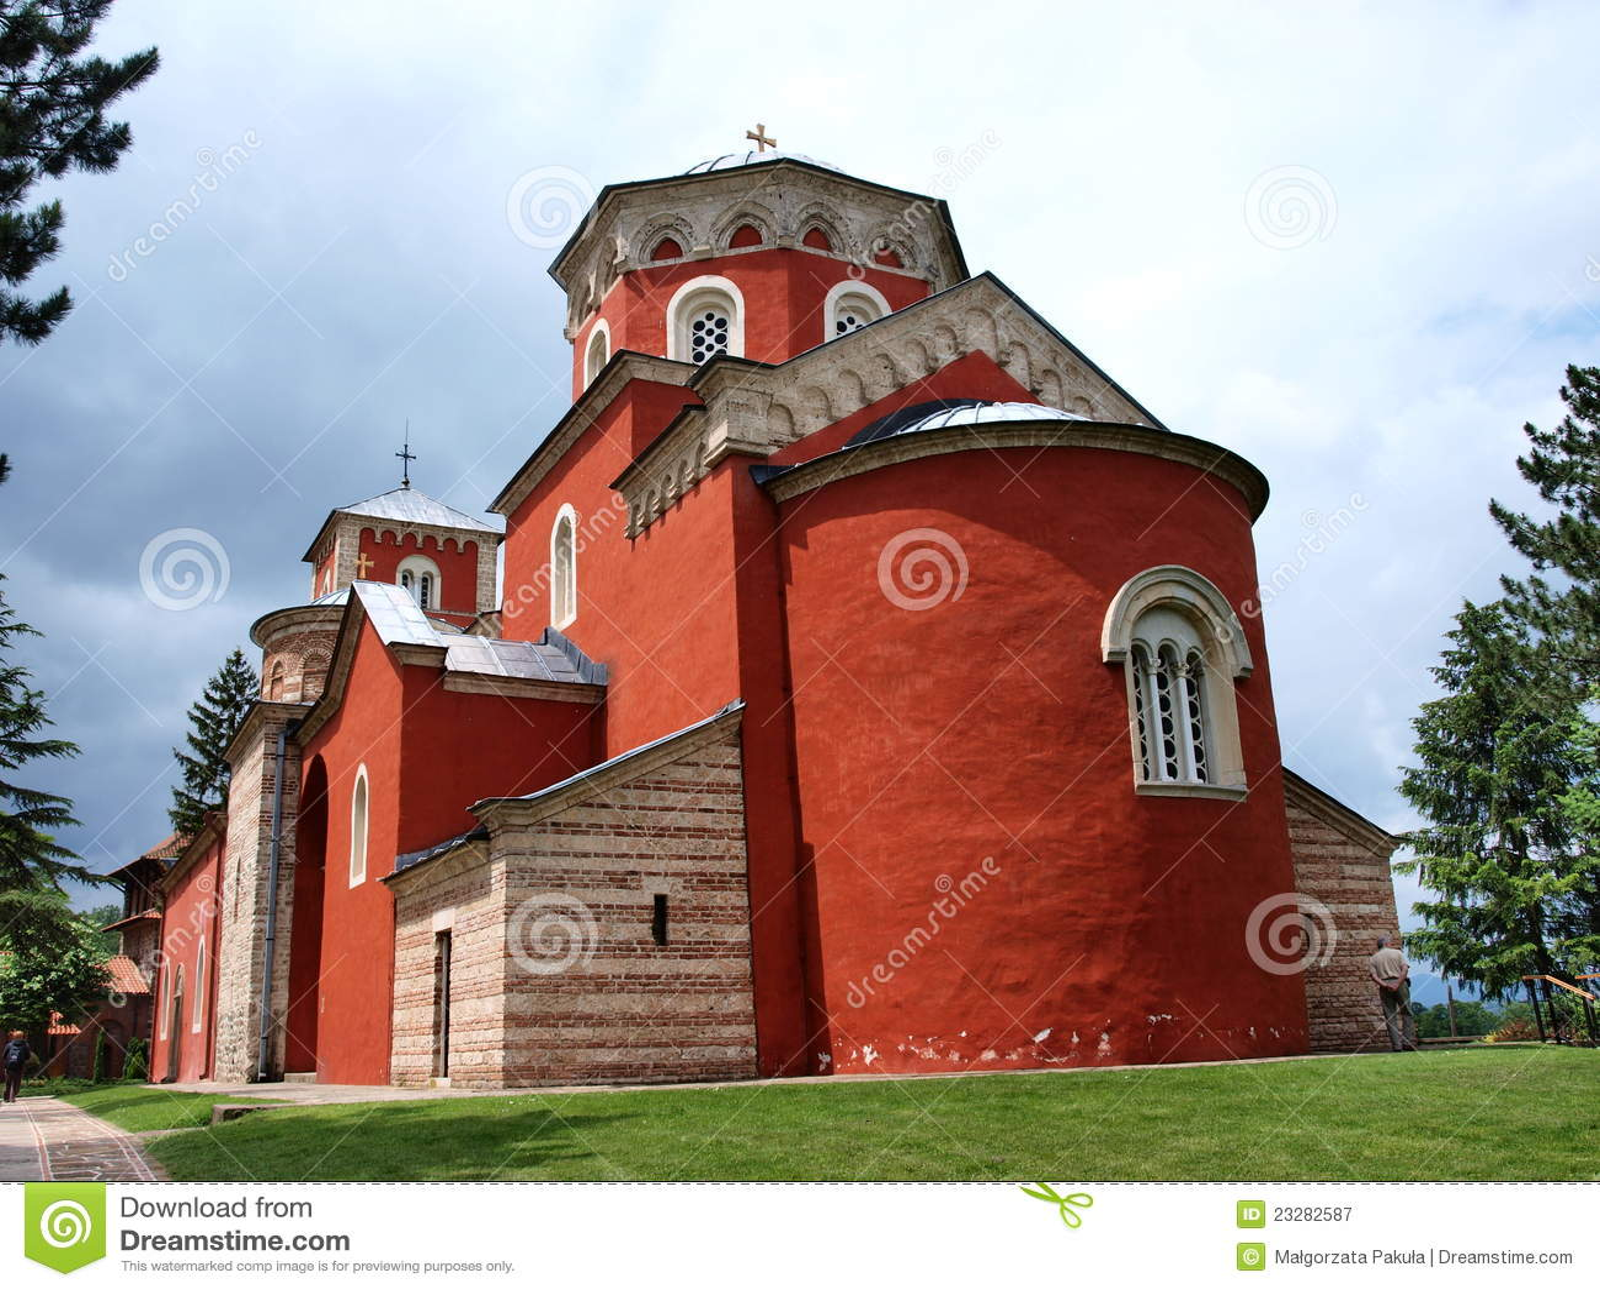 Zica monastery, Serbia